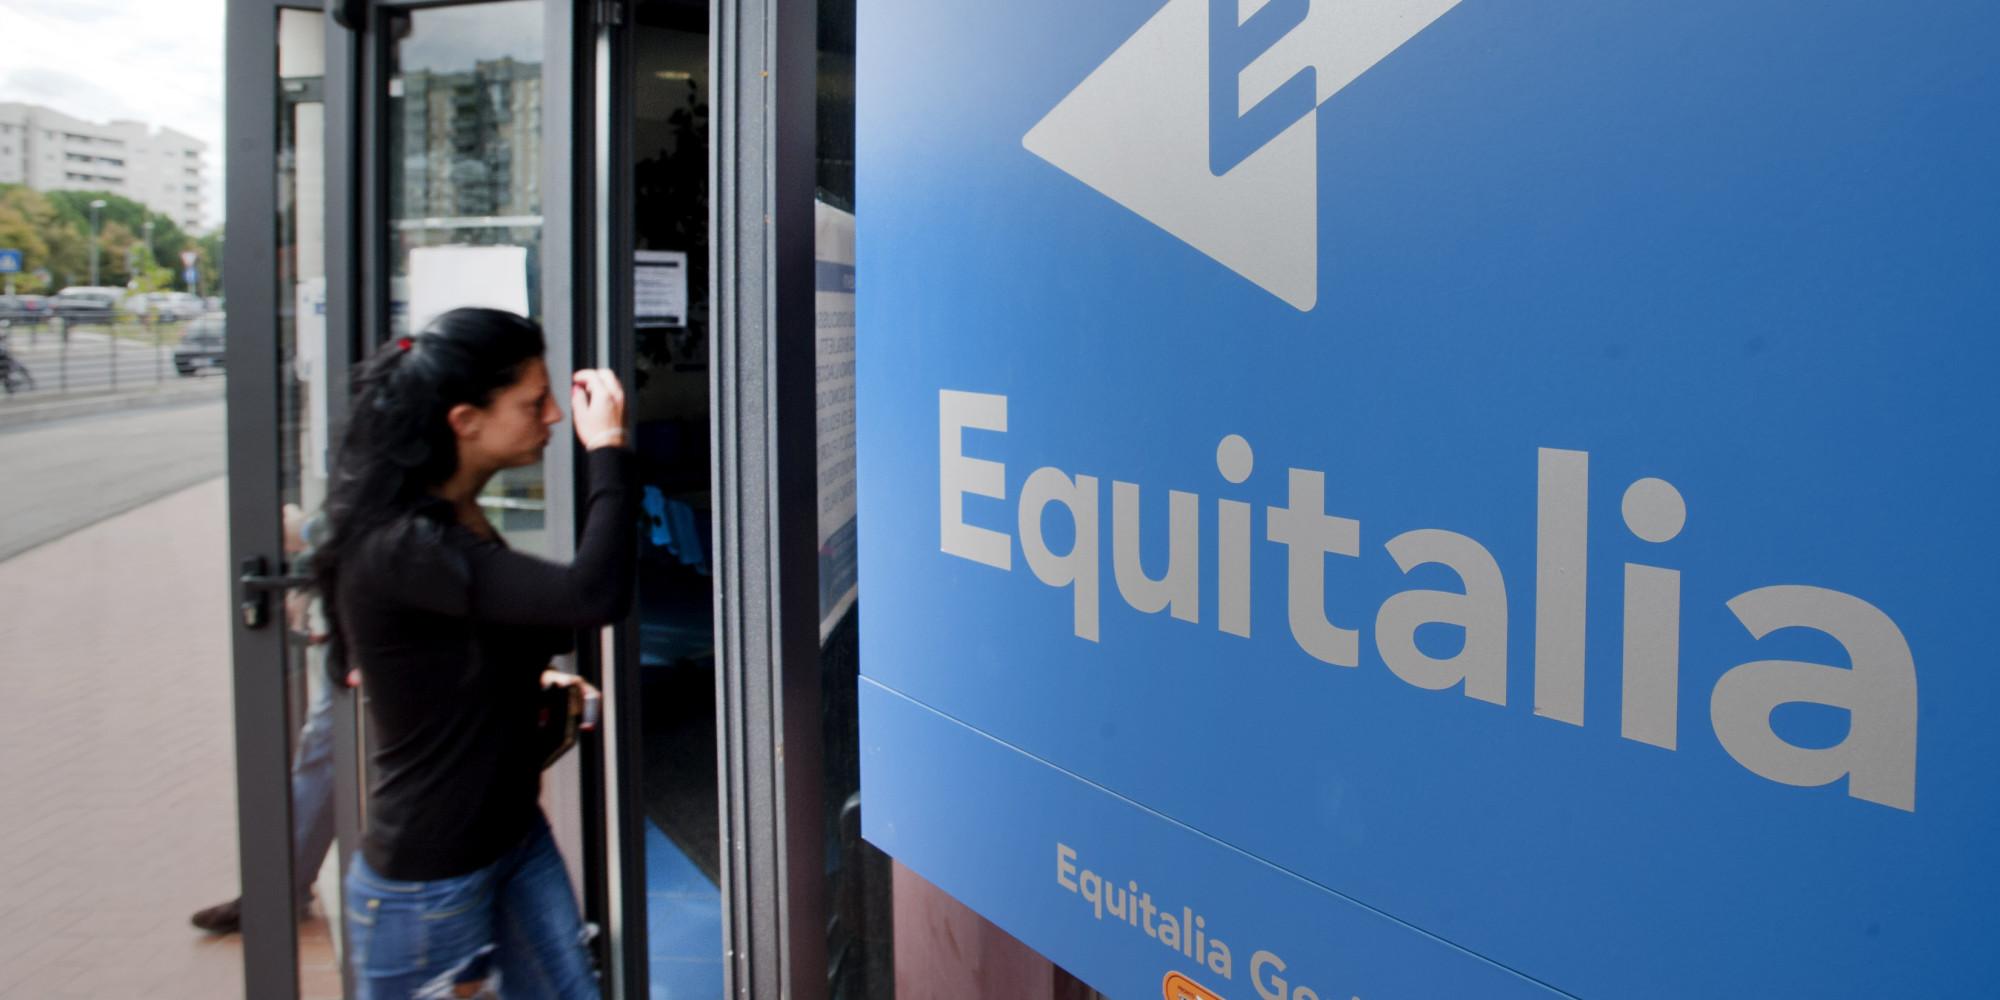 decreto chiusura di Equitalia